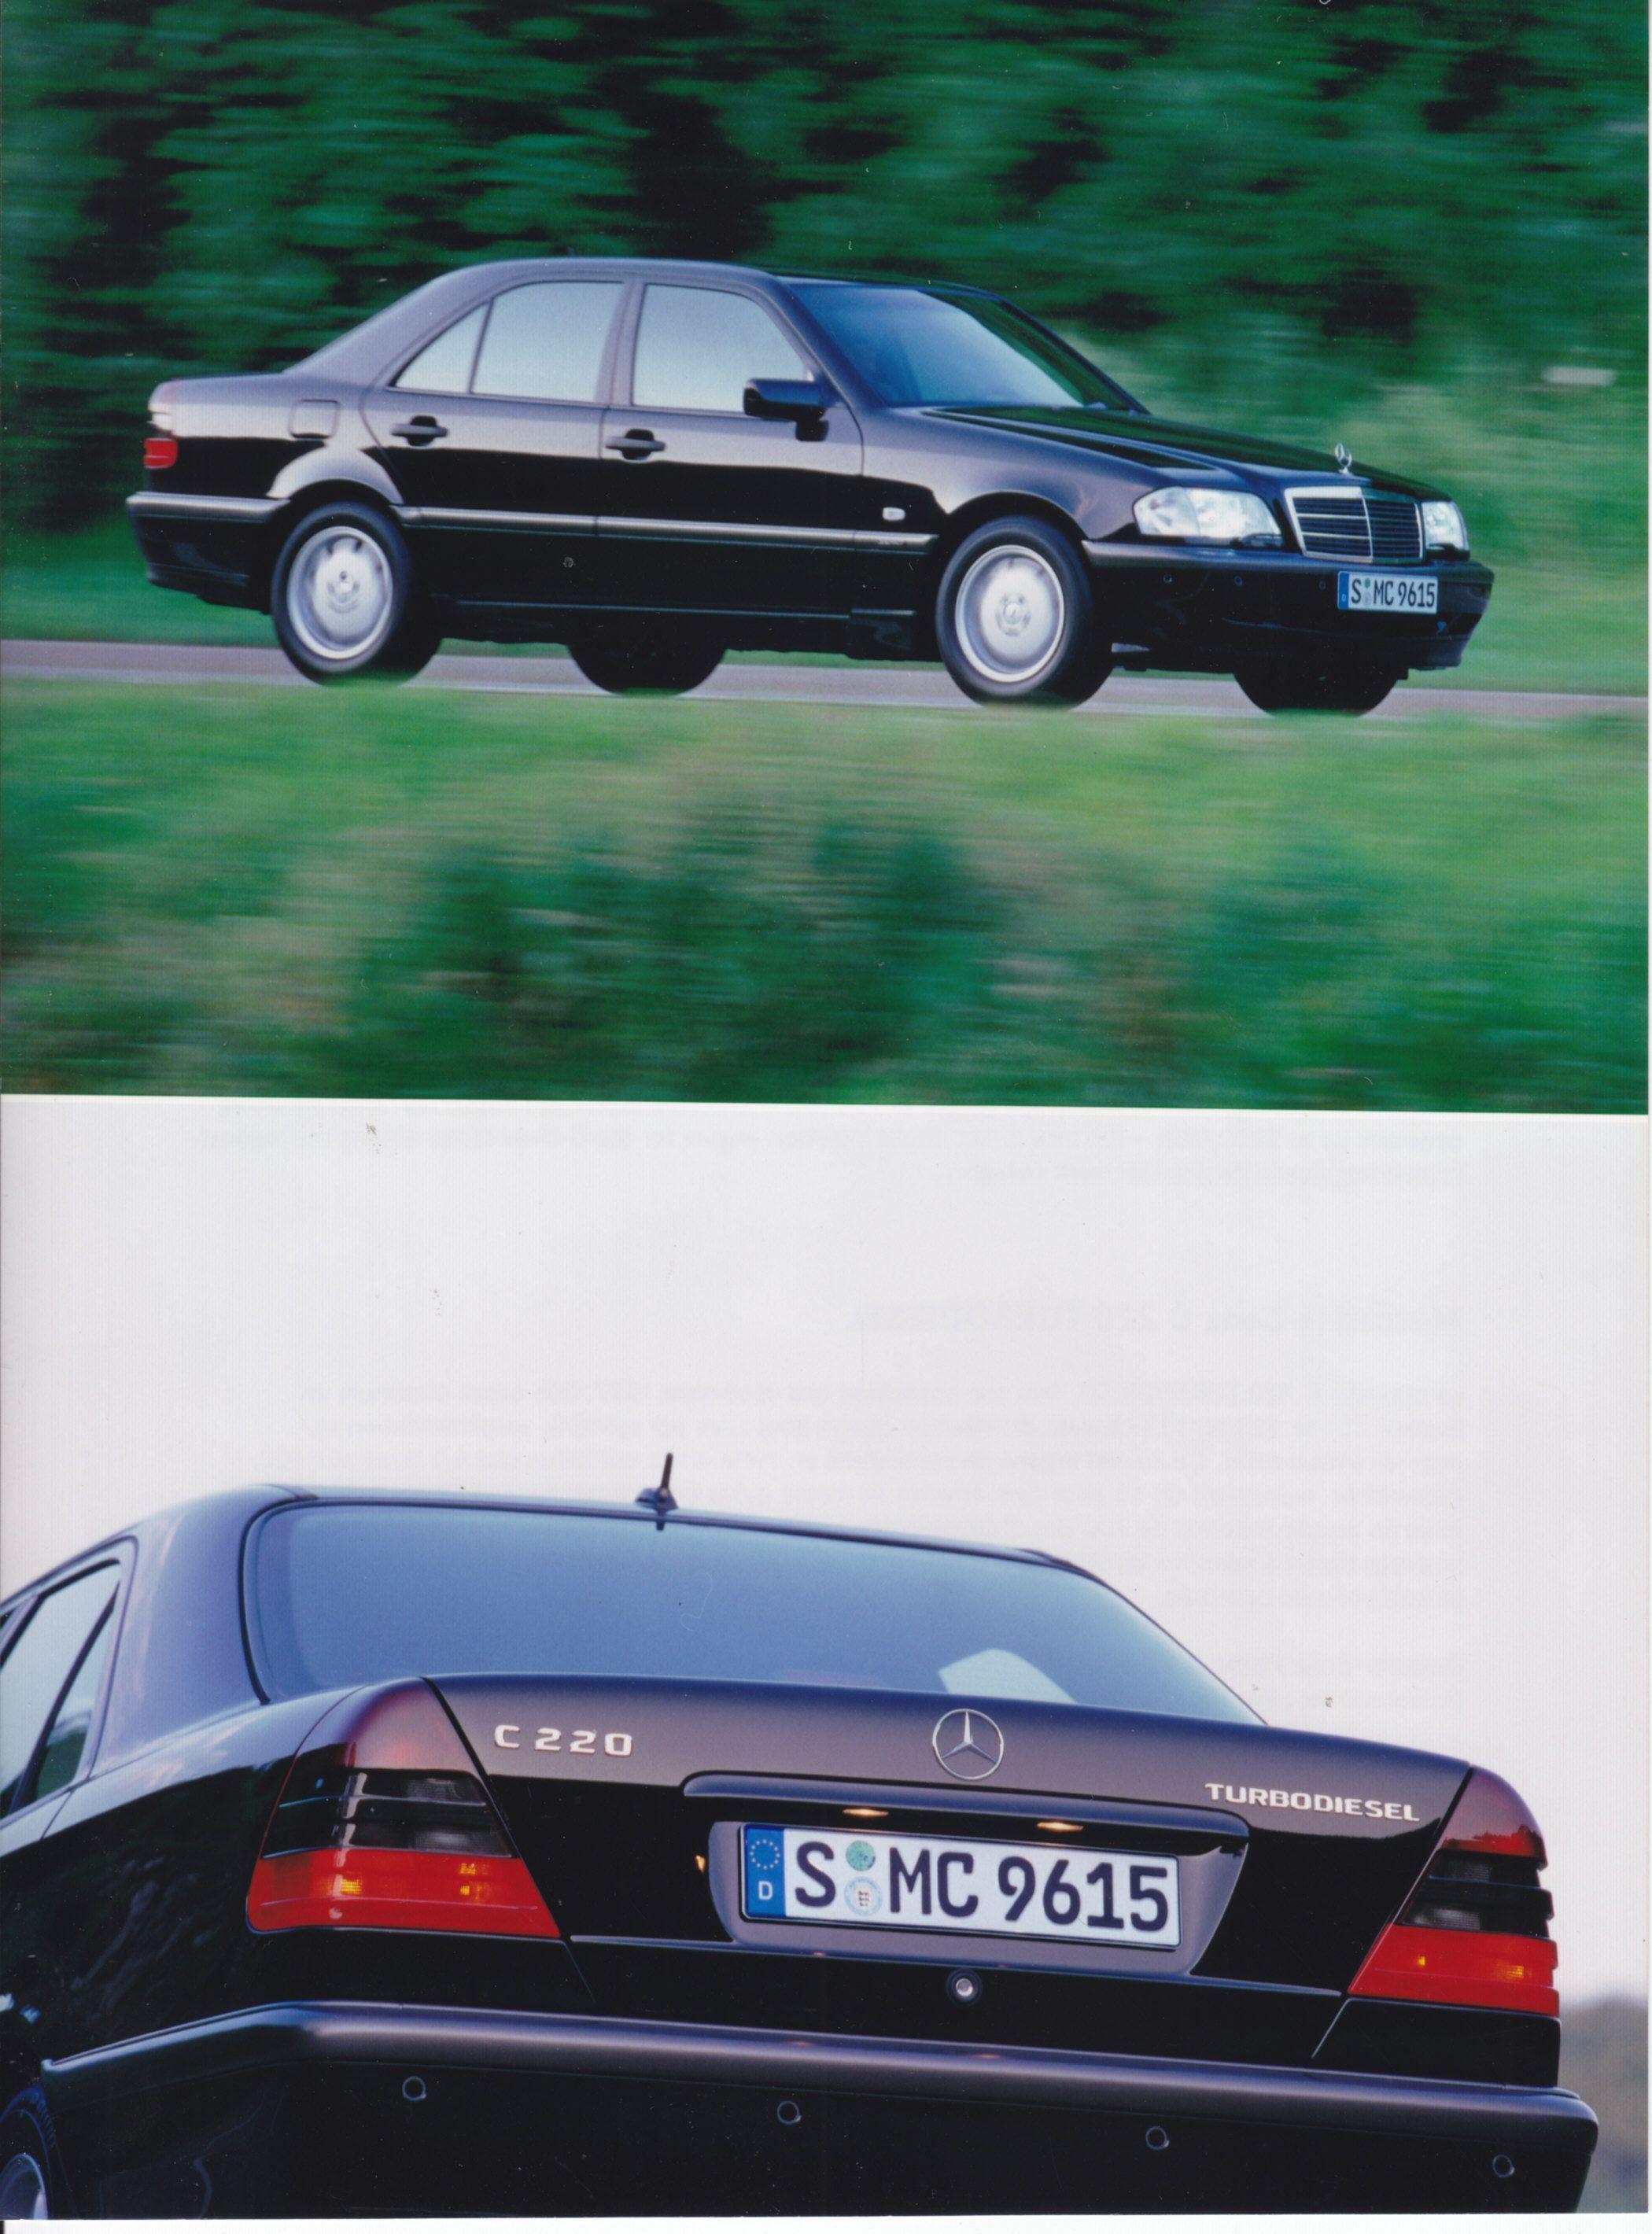 Mercedes-Benz C 220 Turbodiesel (# B97 F 3961) * | Cars | Mercedes